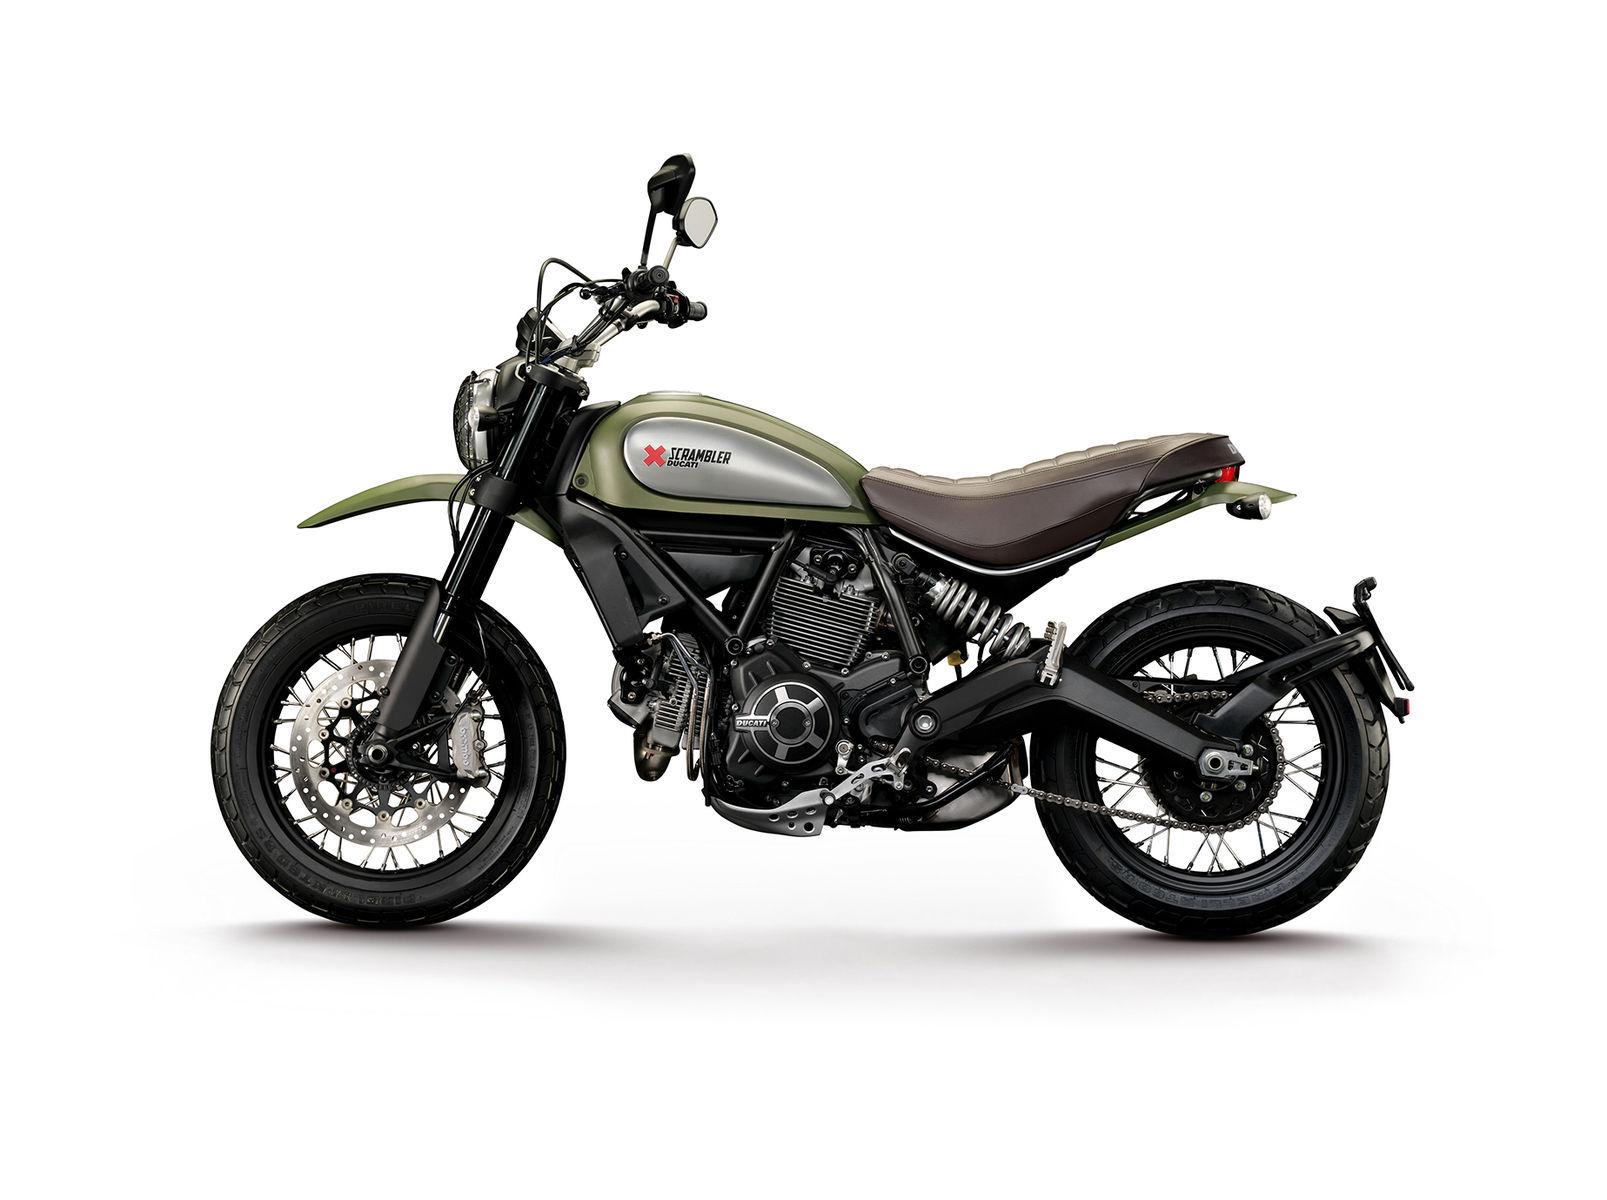 2015 Ducati Scrambler Icon | Ducati Scrambler - Green Left Side